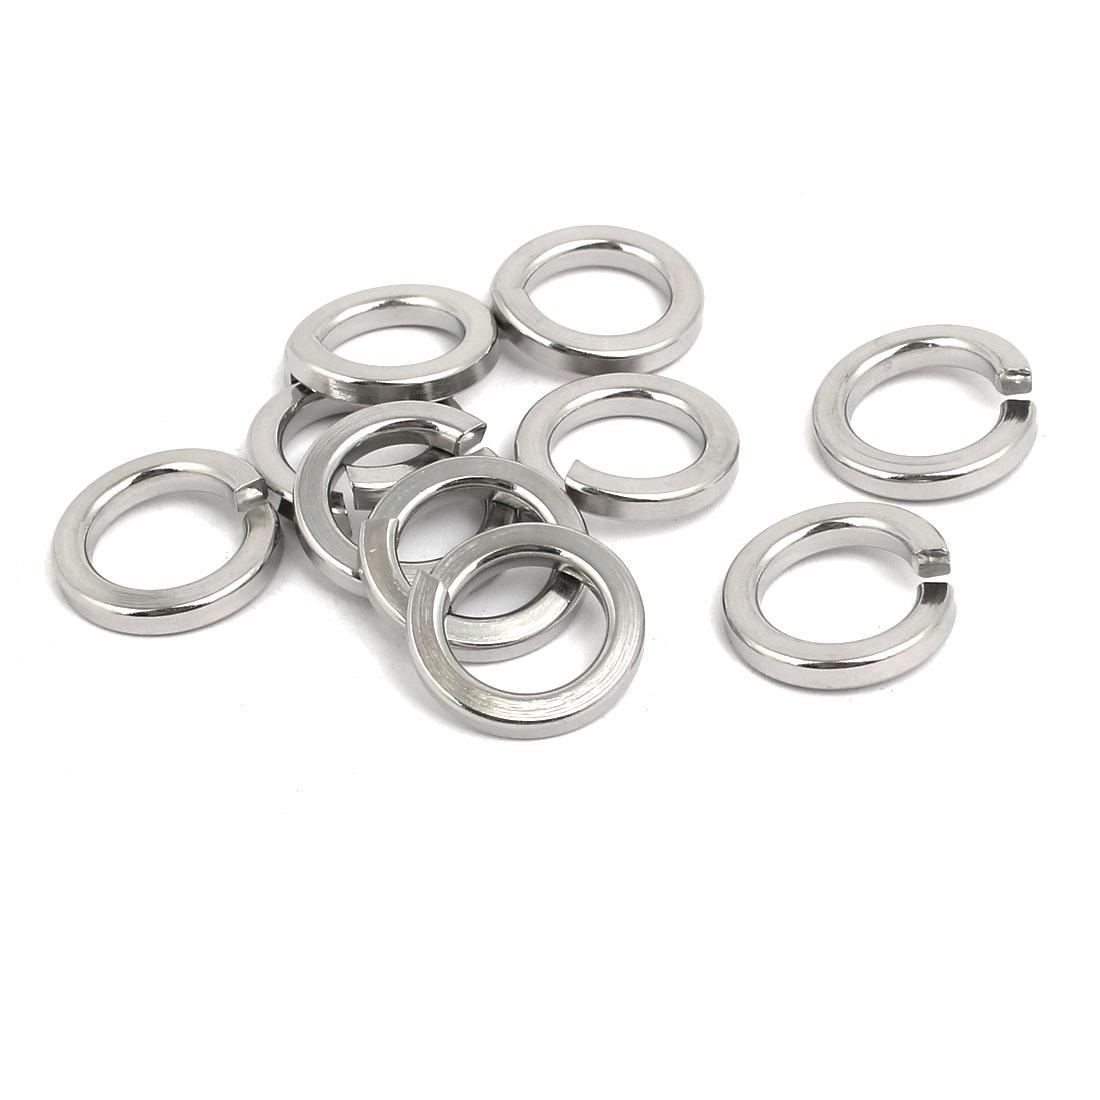 M12 304 Stainless Steel Split Lock Washer Silver Tone 10pcs